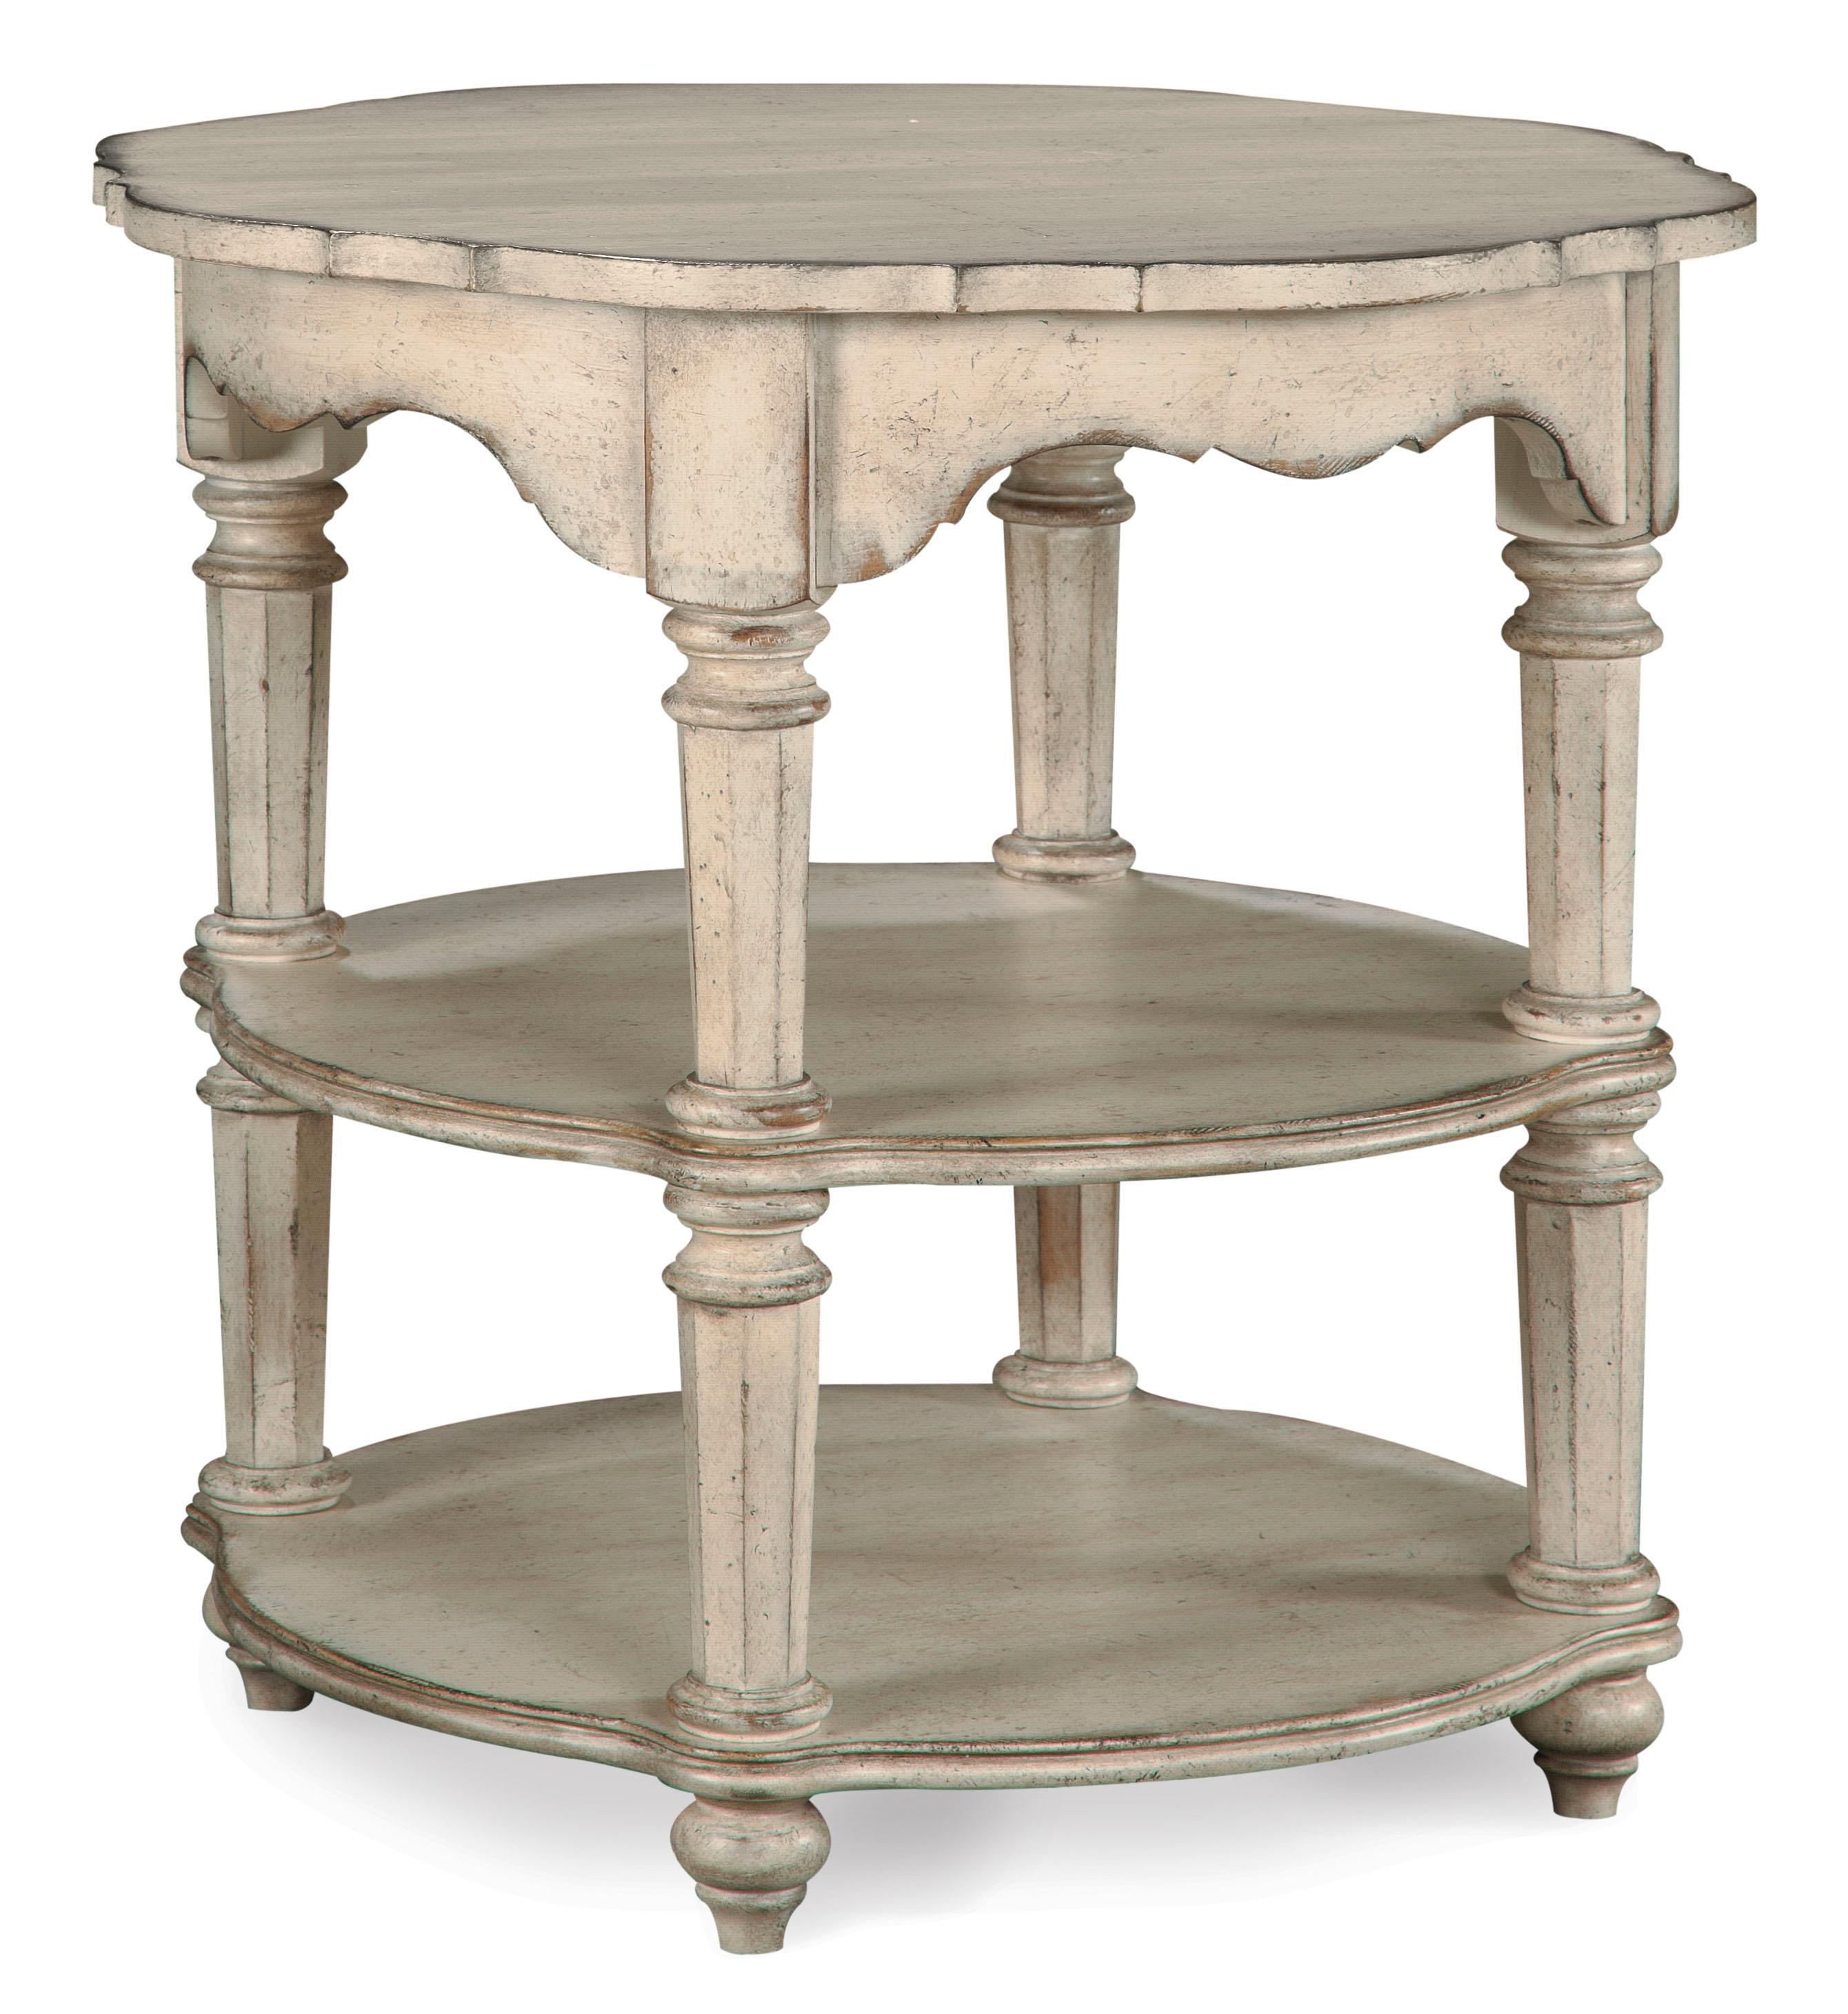 Belfort Signature Farrington Lamp Table - Item Number: 189303-2617